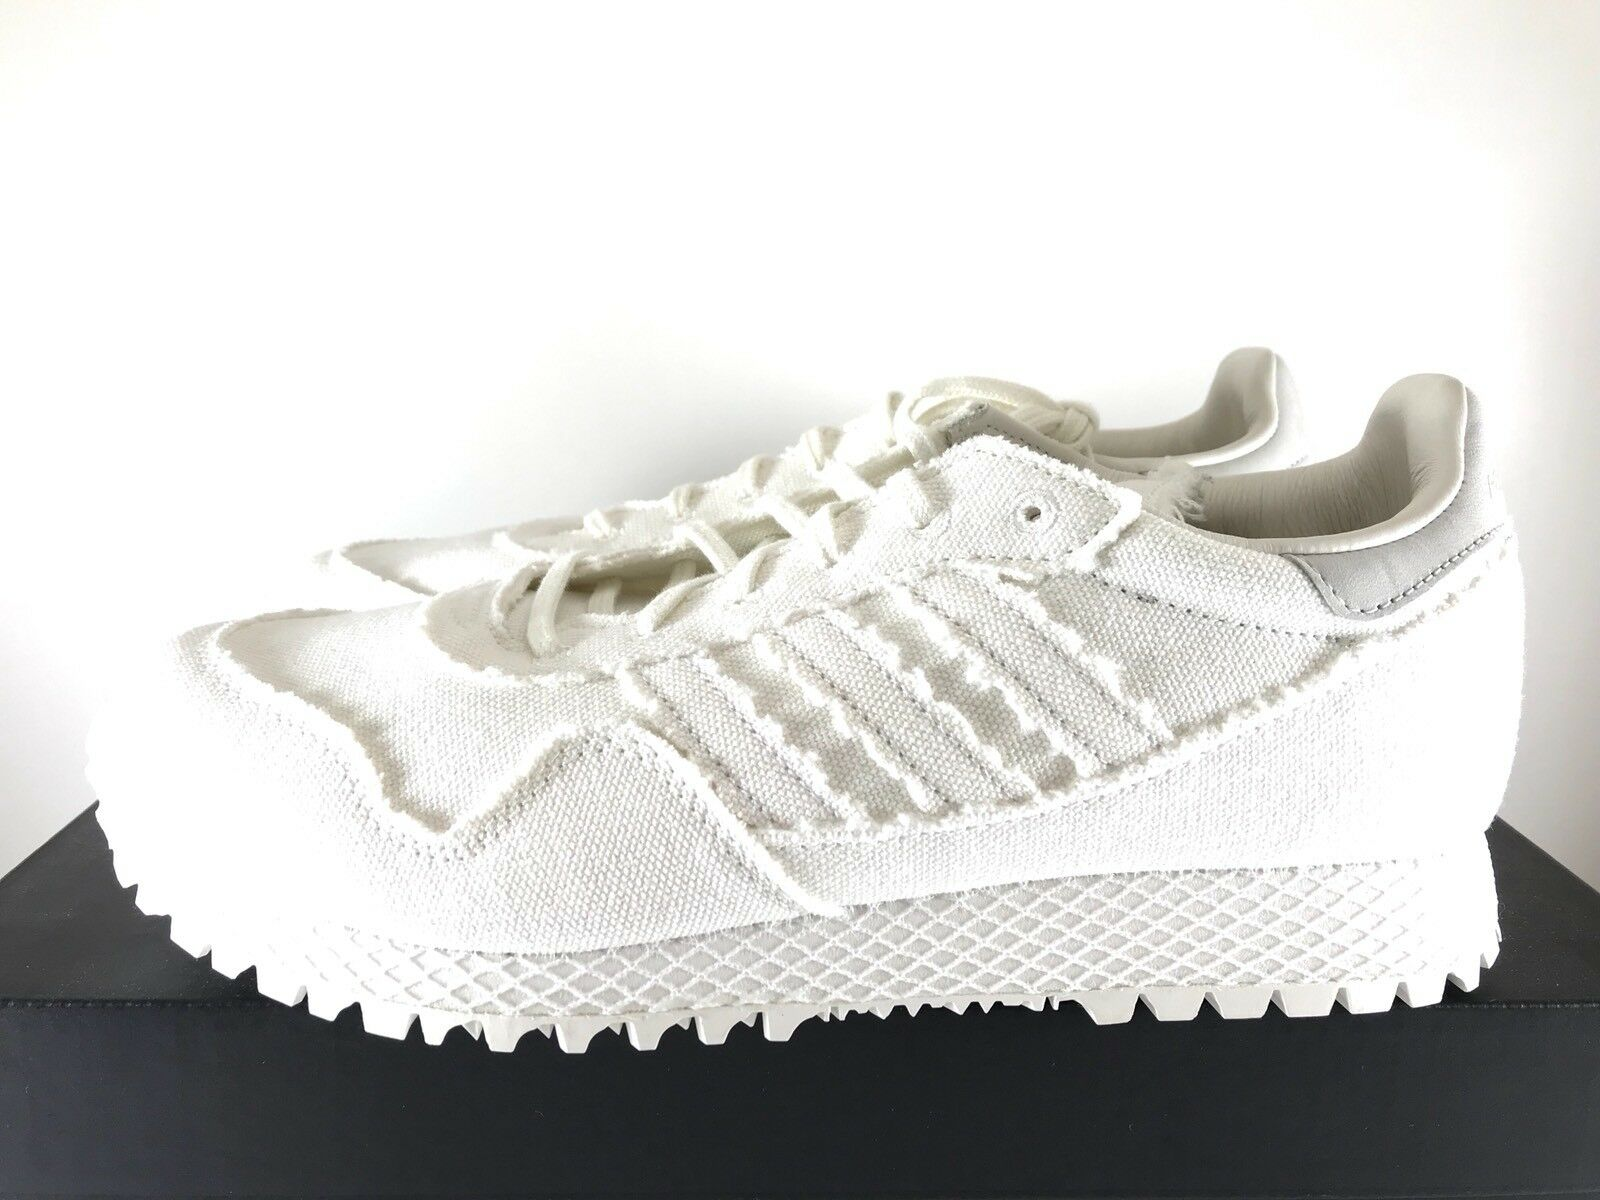 Adidas Consortium New York Daniel Arsham CM7193 the past 1 boost 3 Mens Size 8